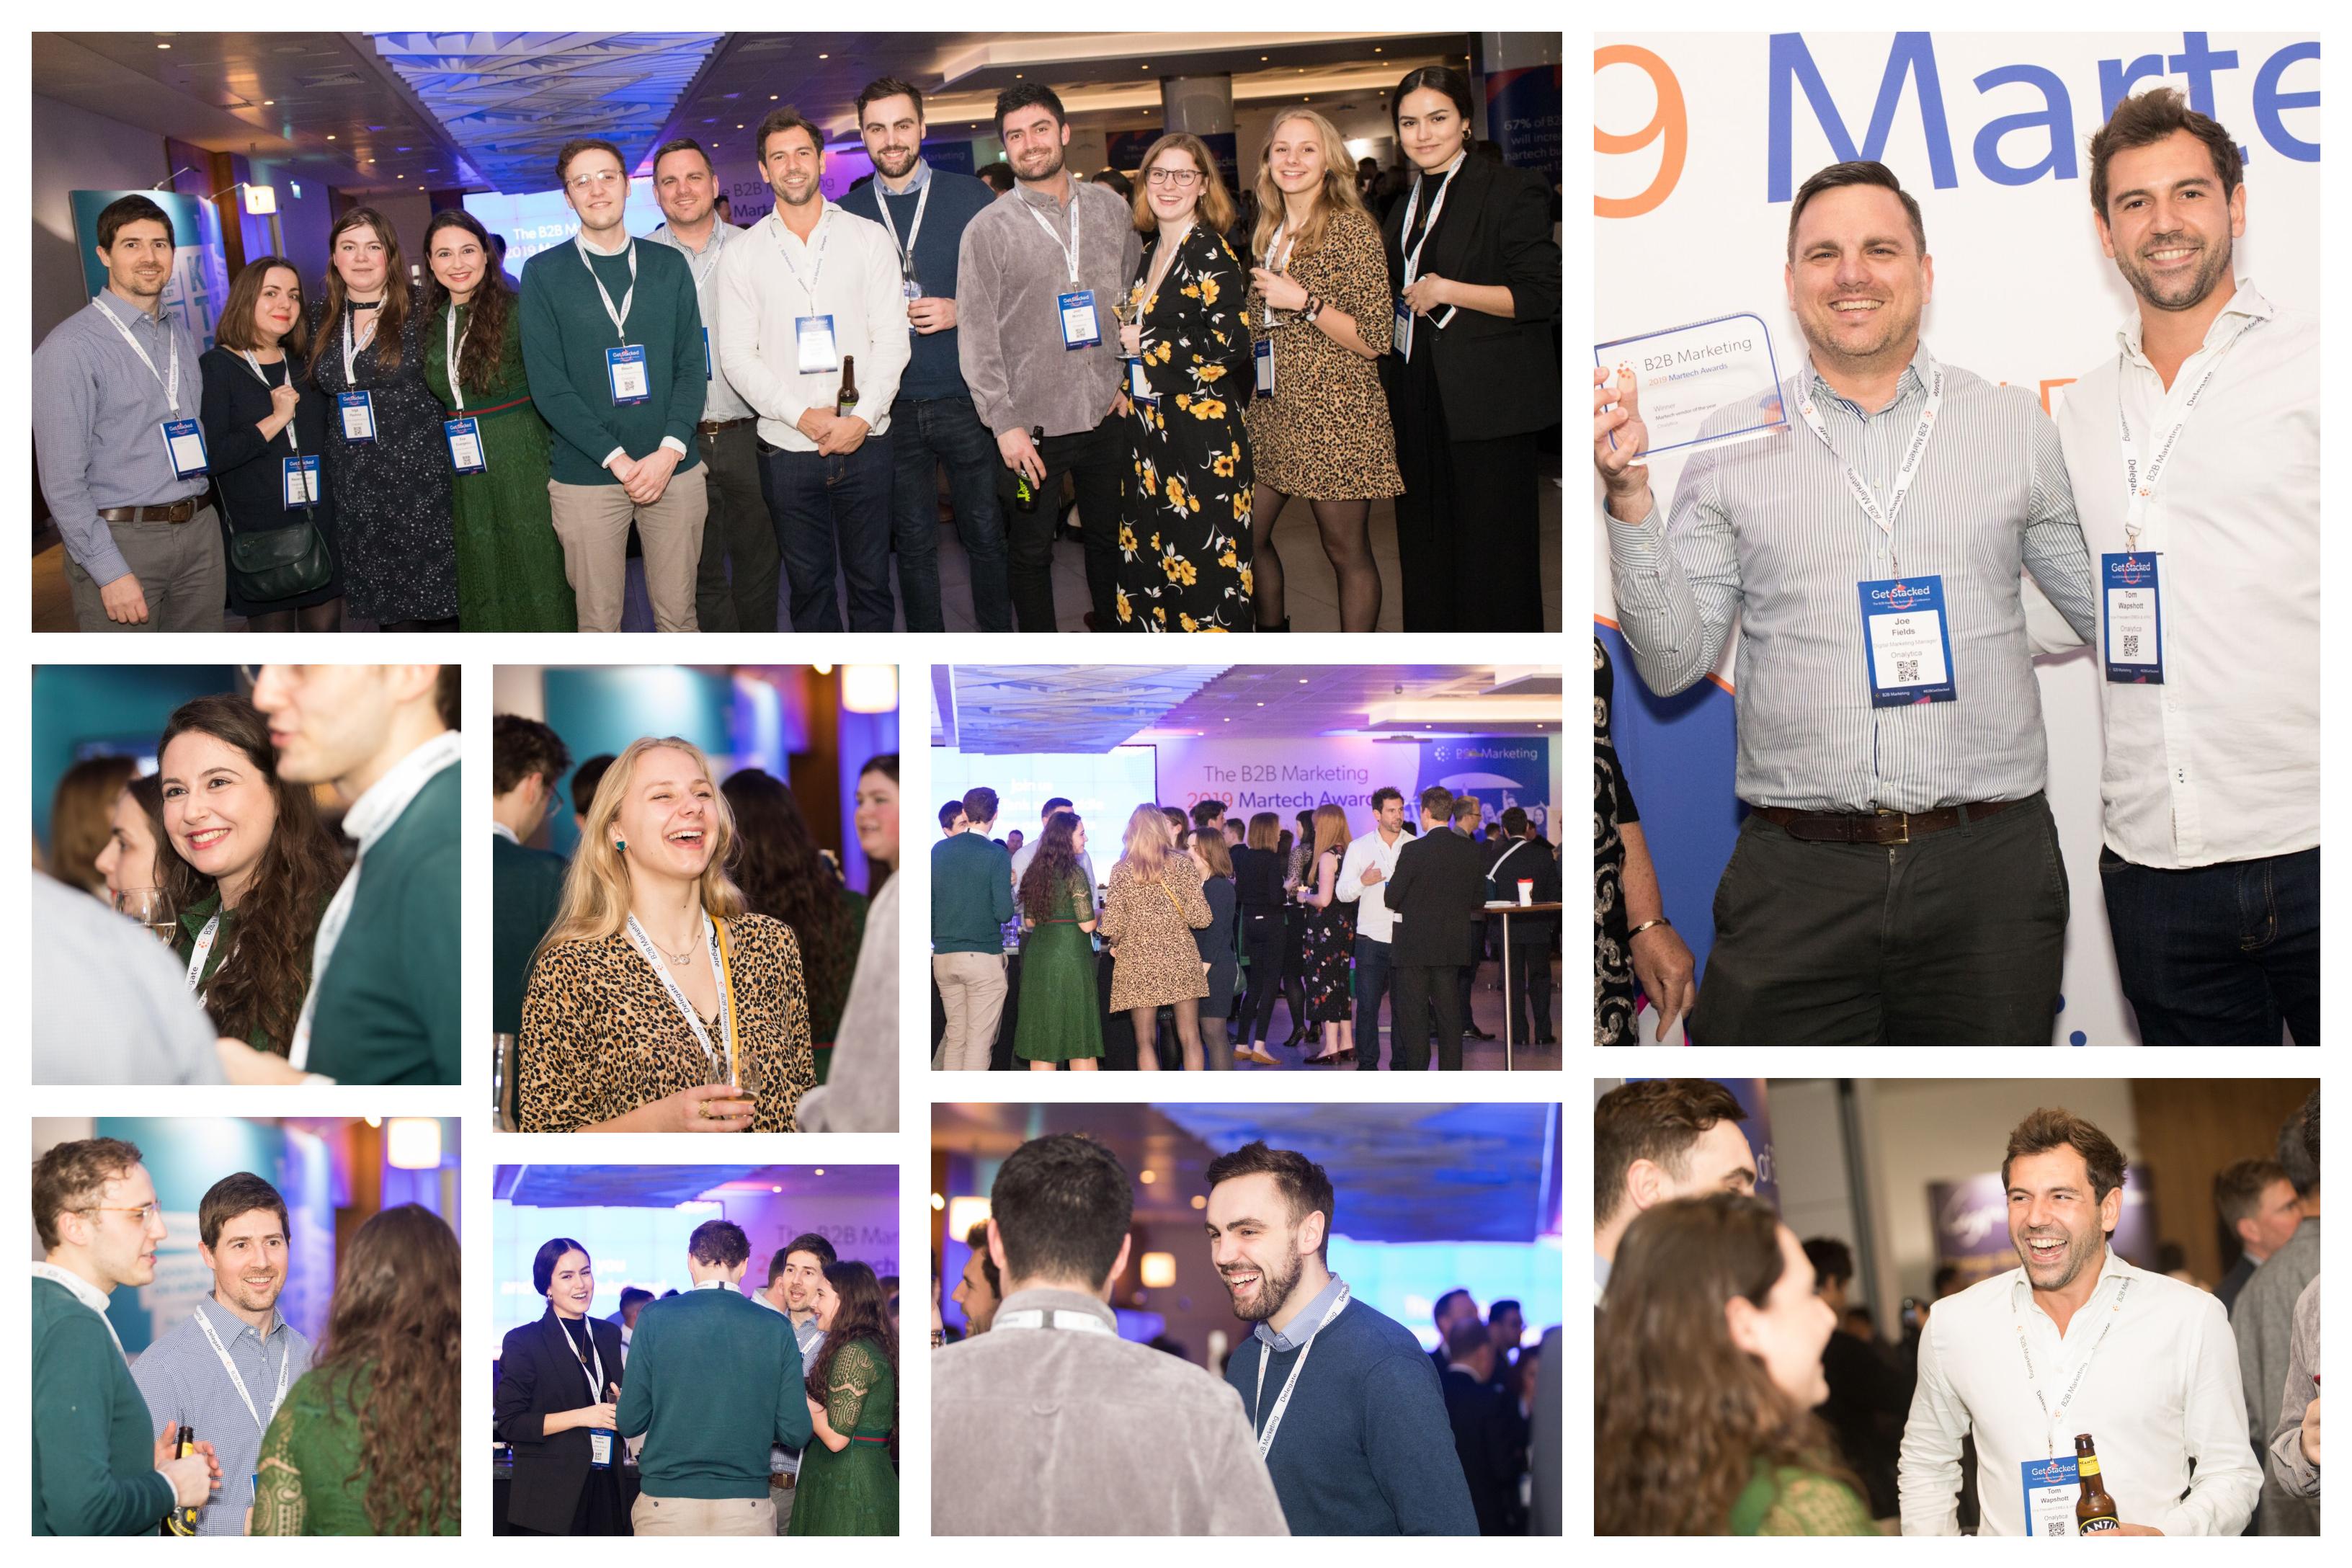 Onalytica B2B MarTech Awards